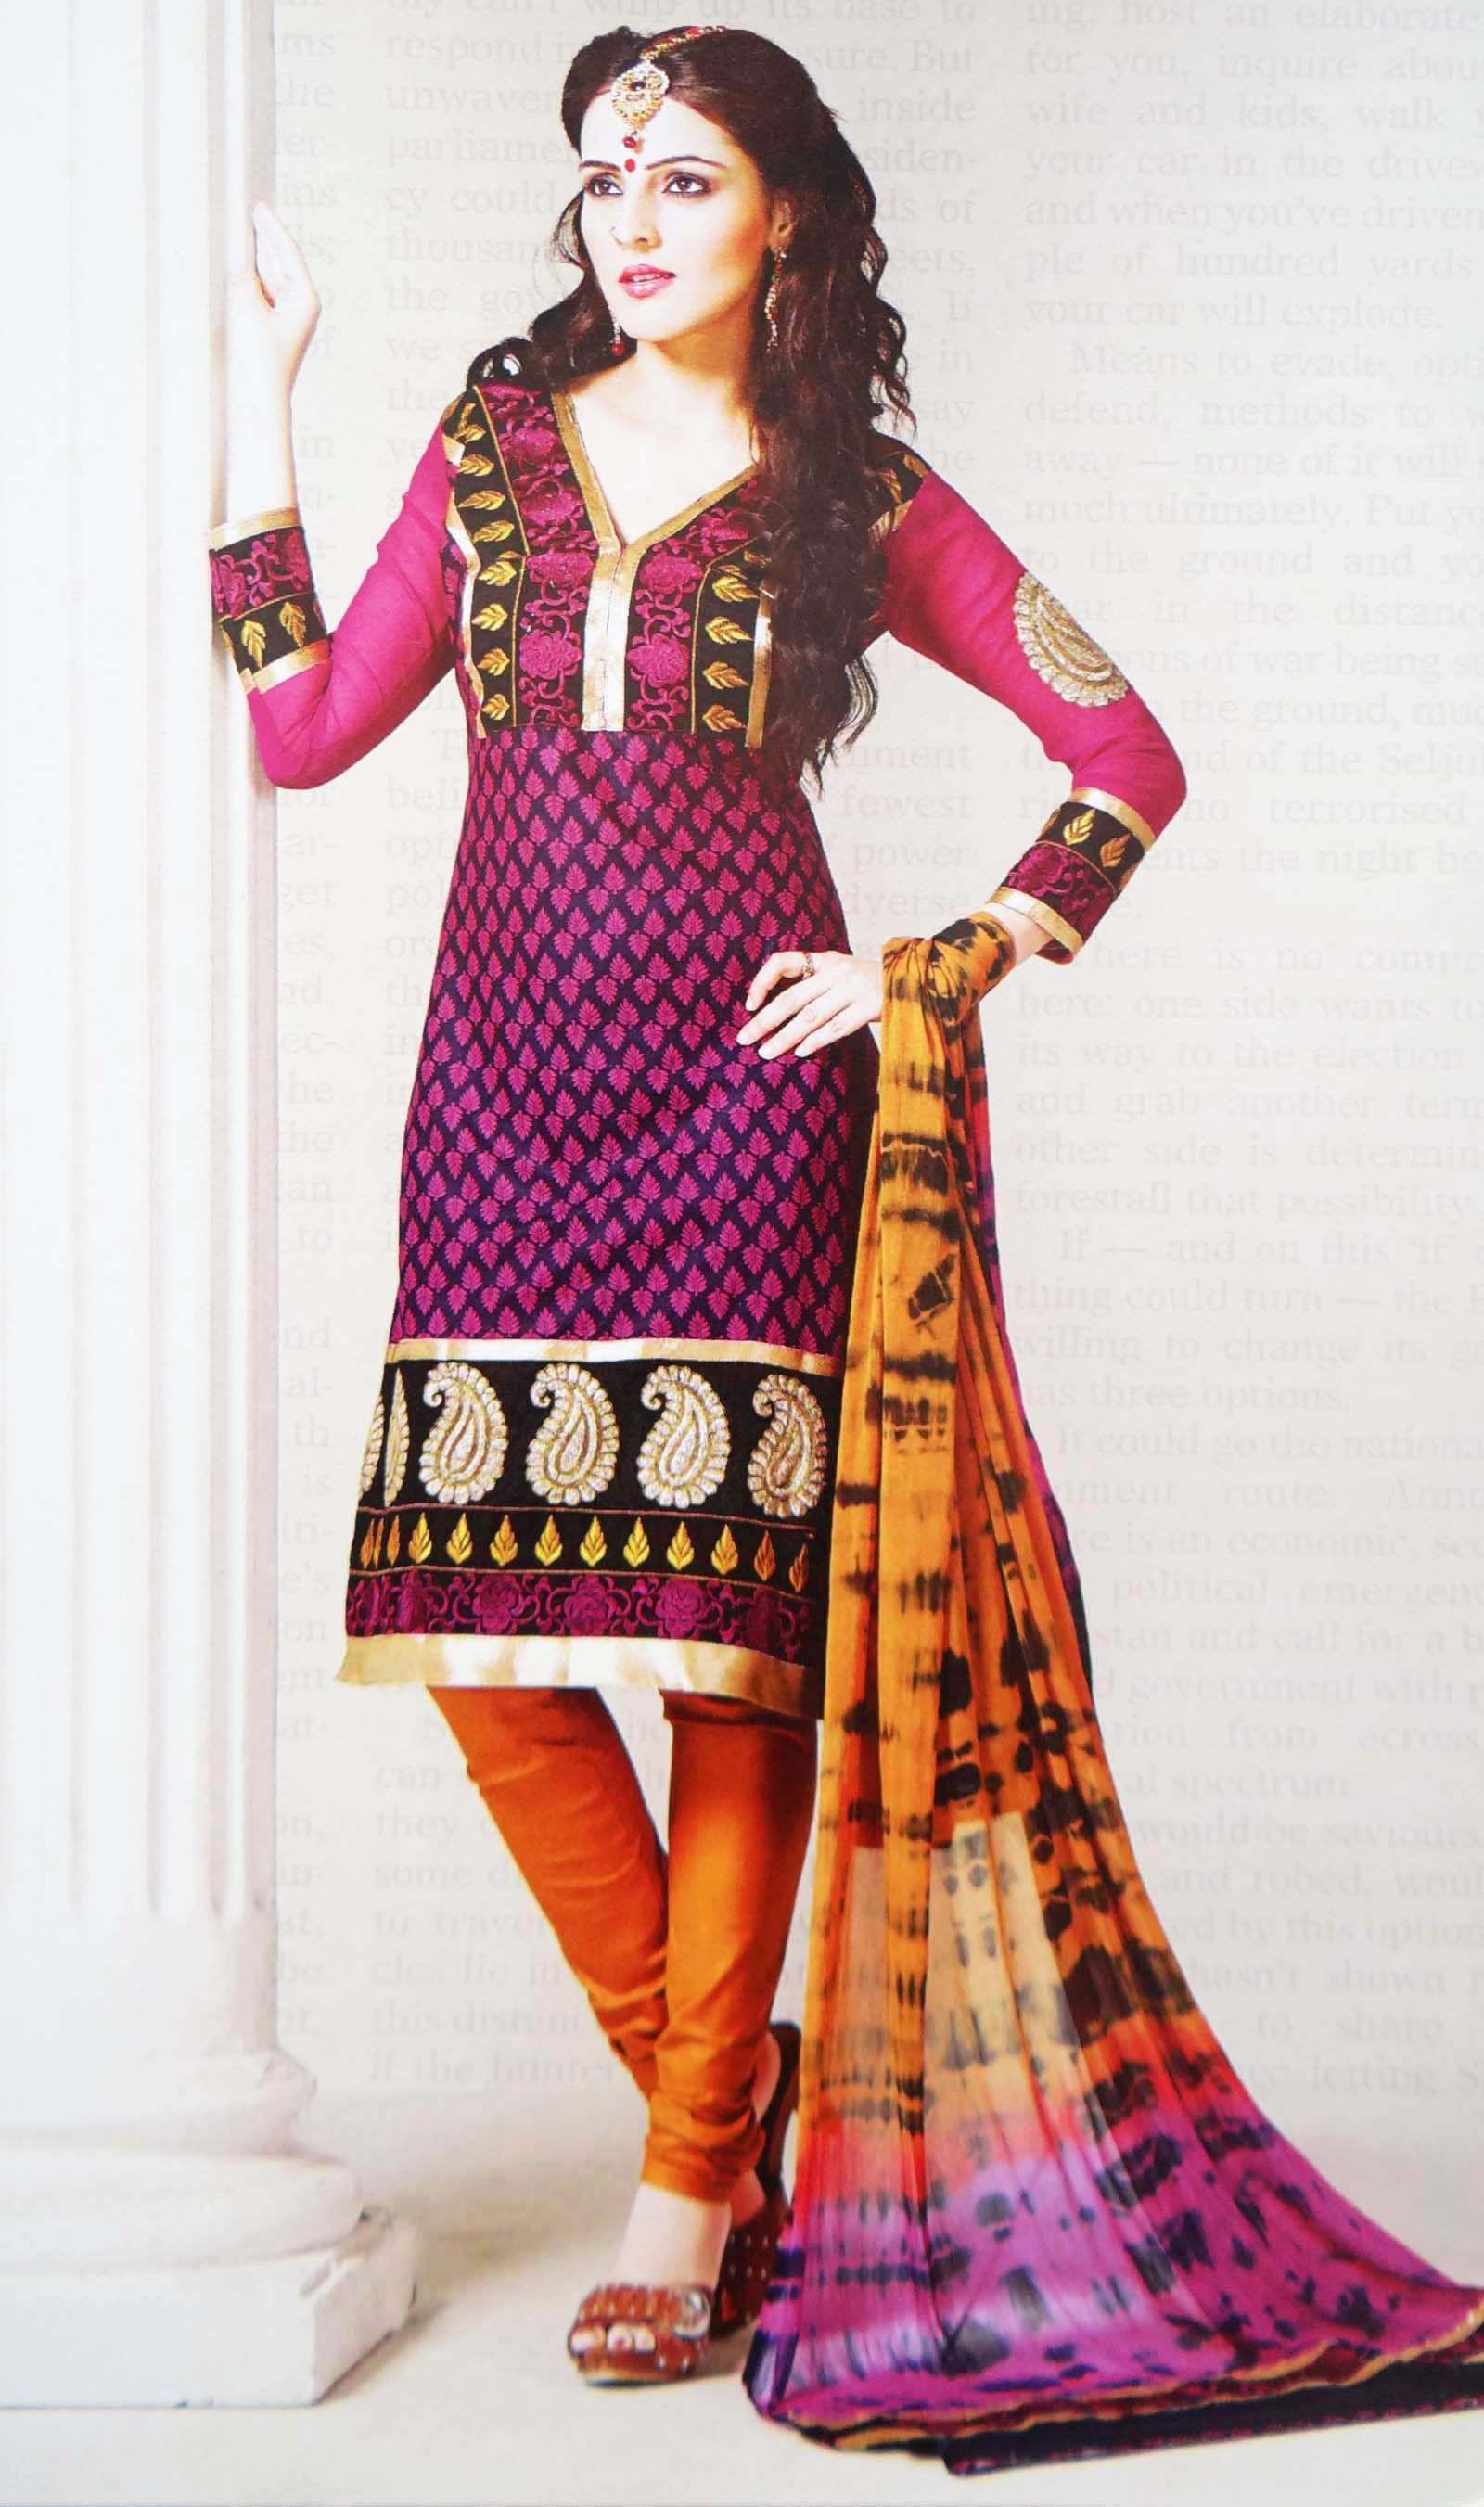 Fashion clothes salwar kameez suits cover me with color